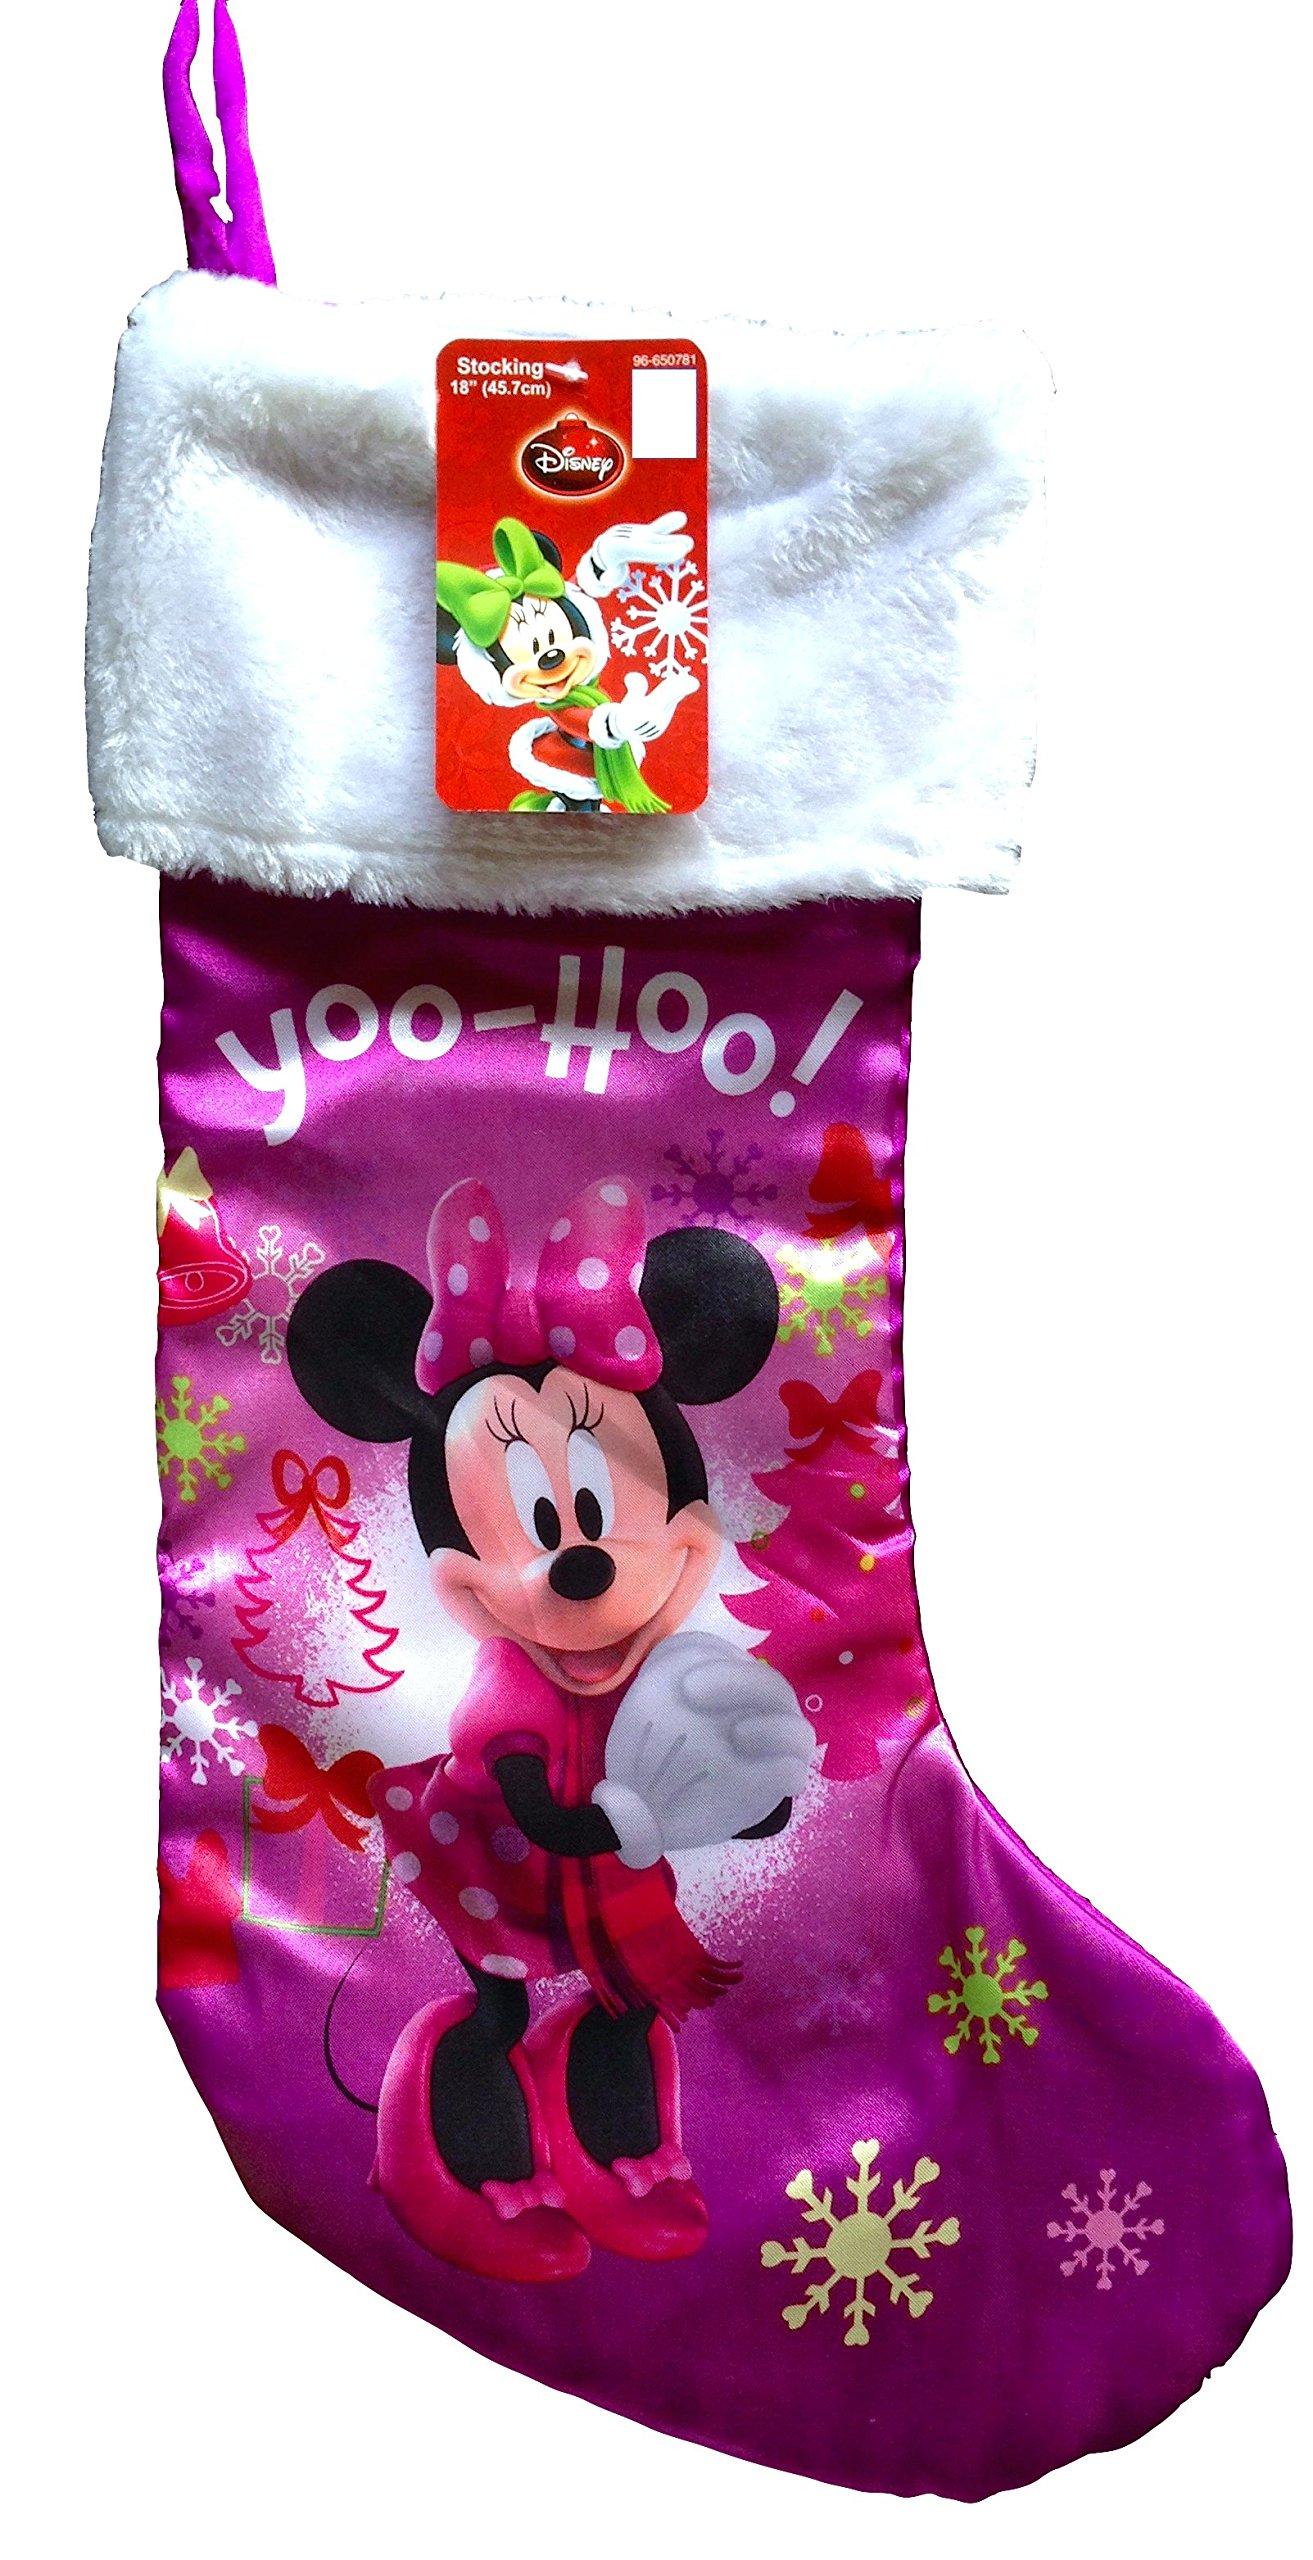 disney mickey mouse christmas stocking or minnie mouse christmas stocking babys first christmas stockings cute disney - Mickey Mouse Christmas Stocking